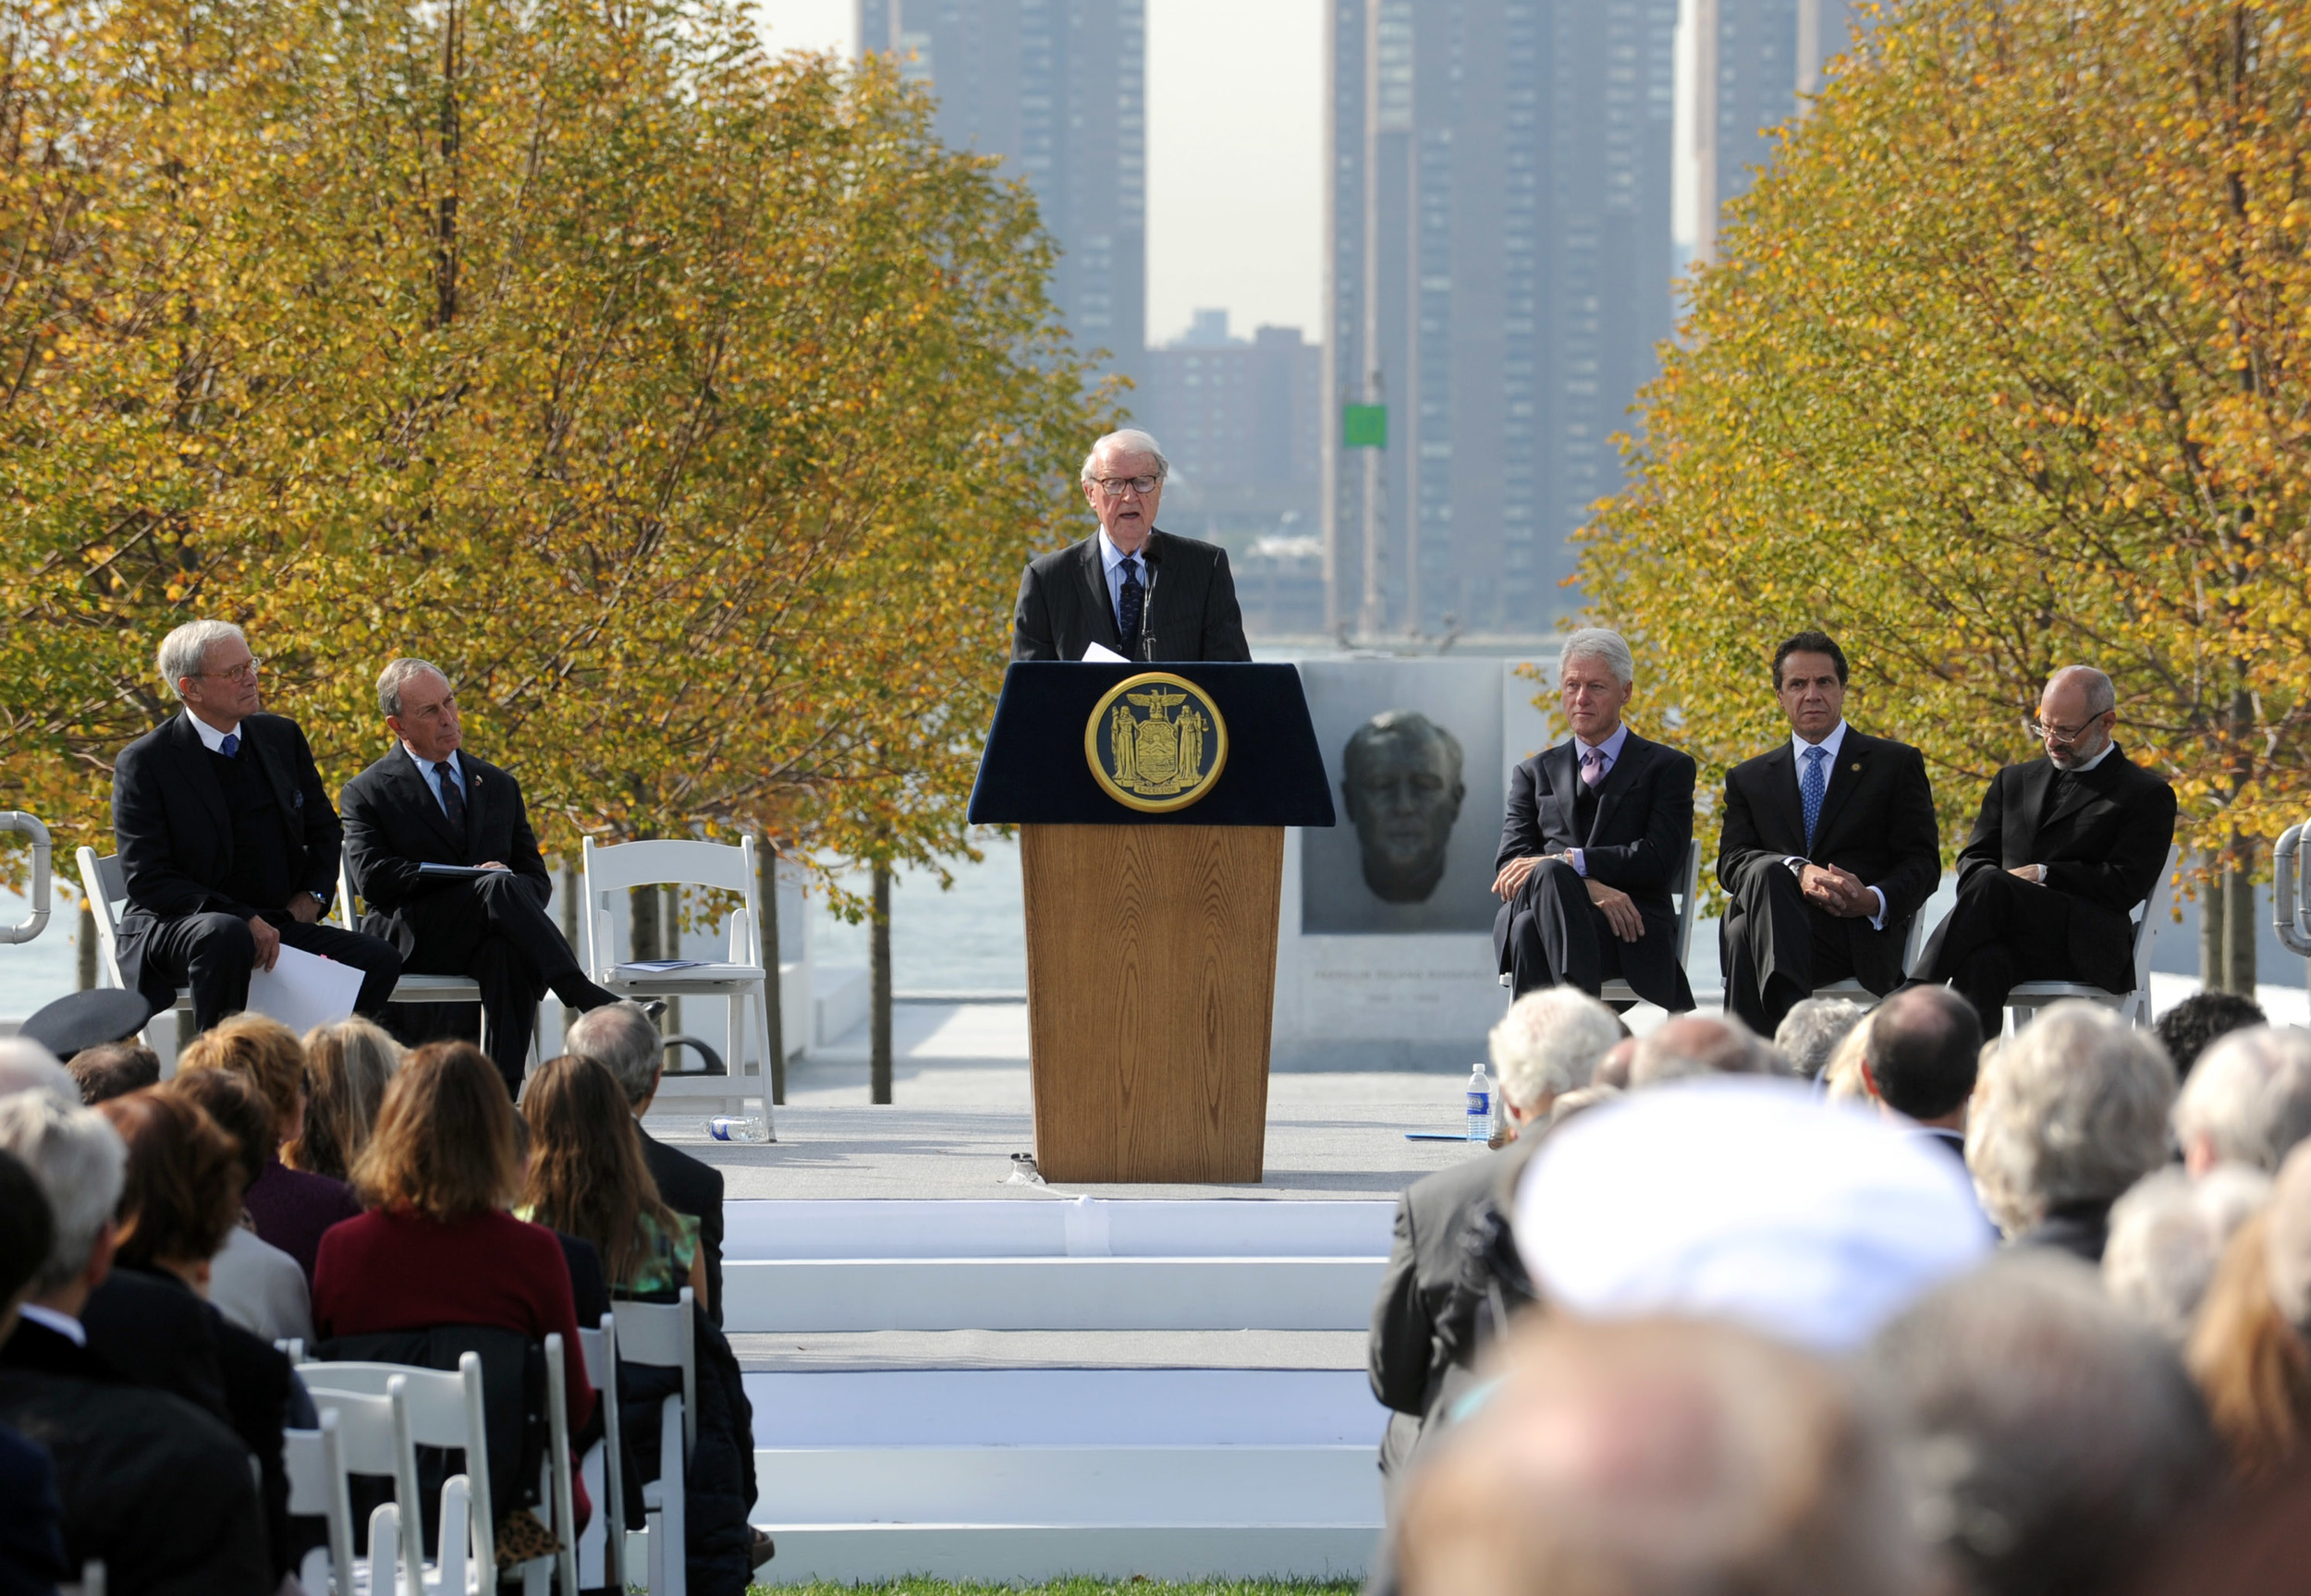 Ambassador vanden Heuvel at the podium.Photo by Diane Bondareff